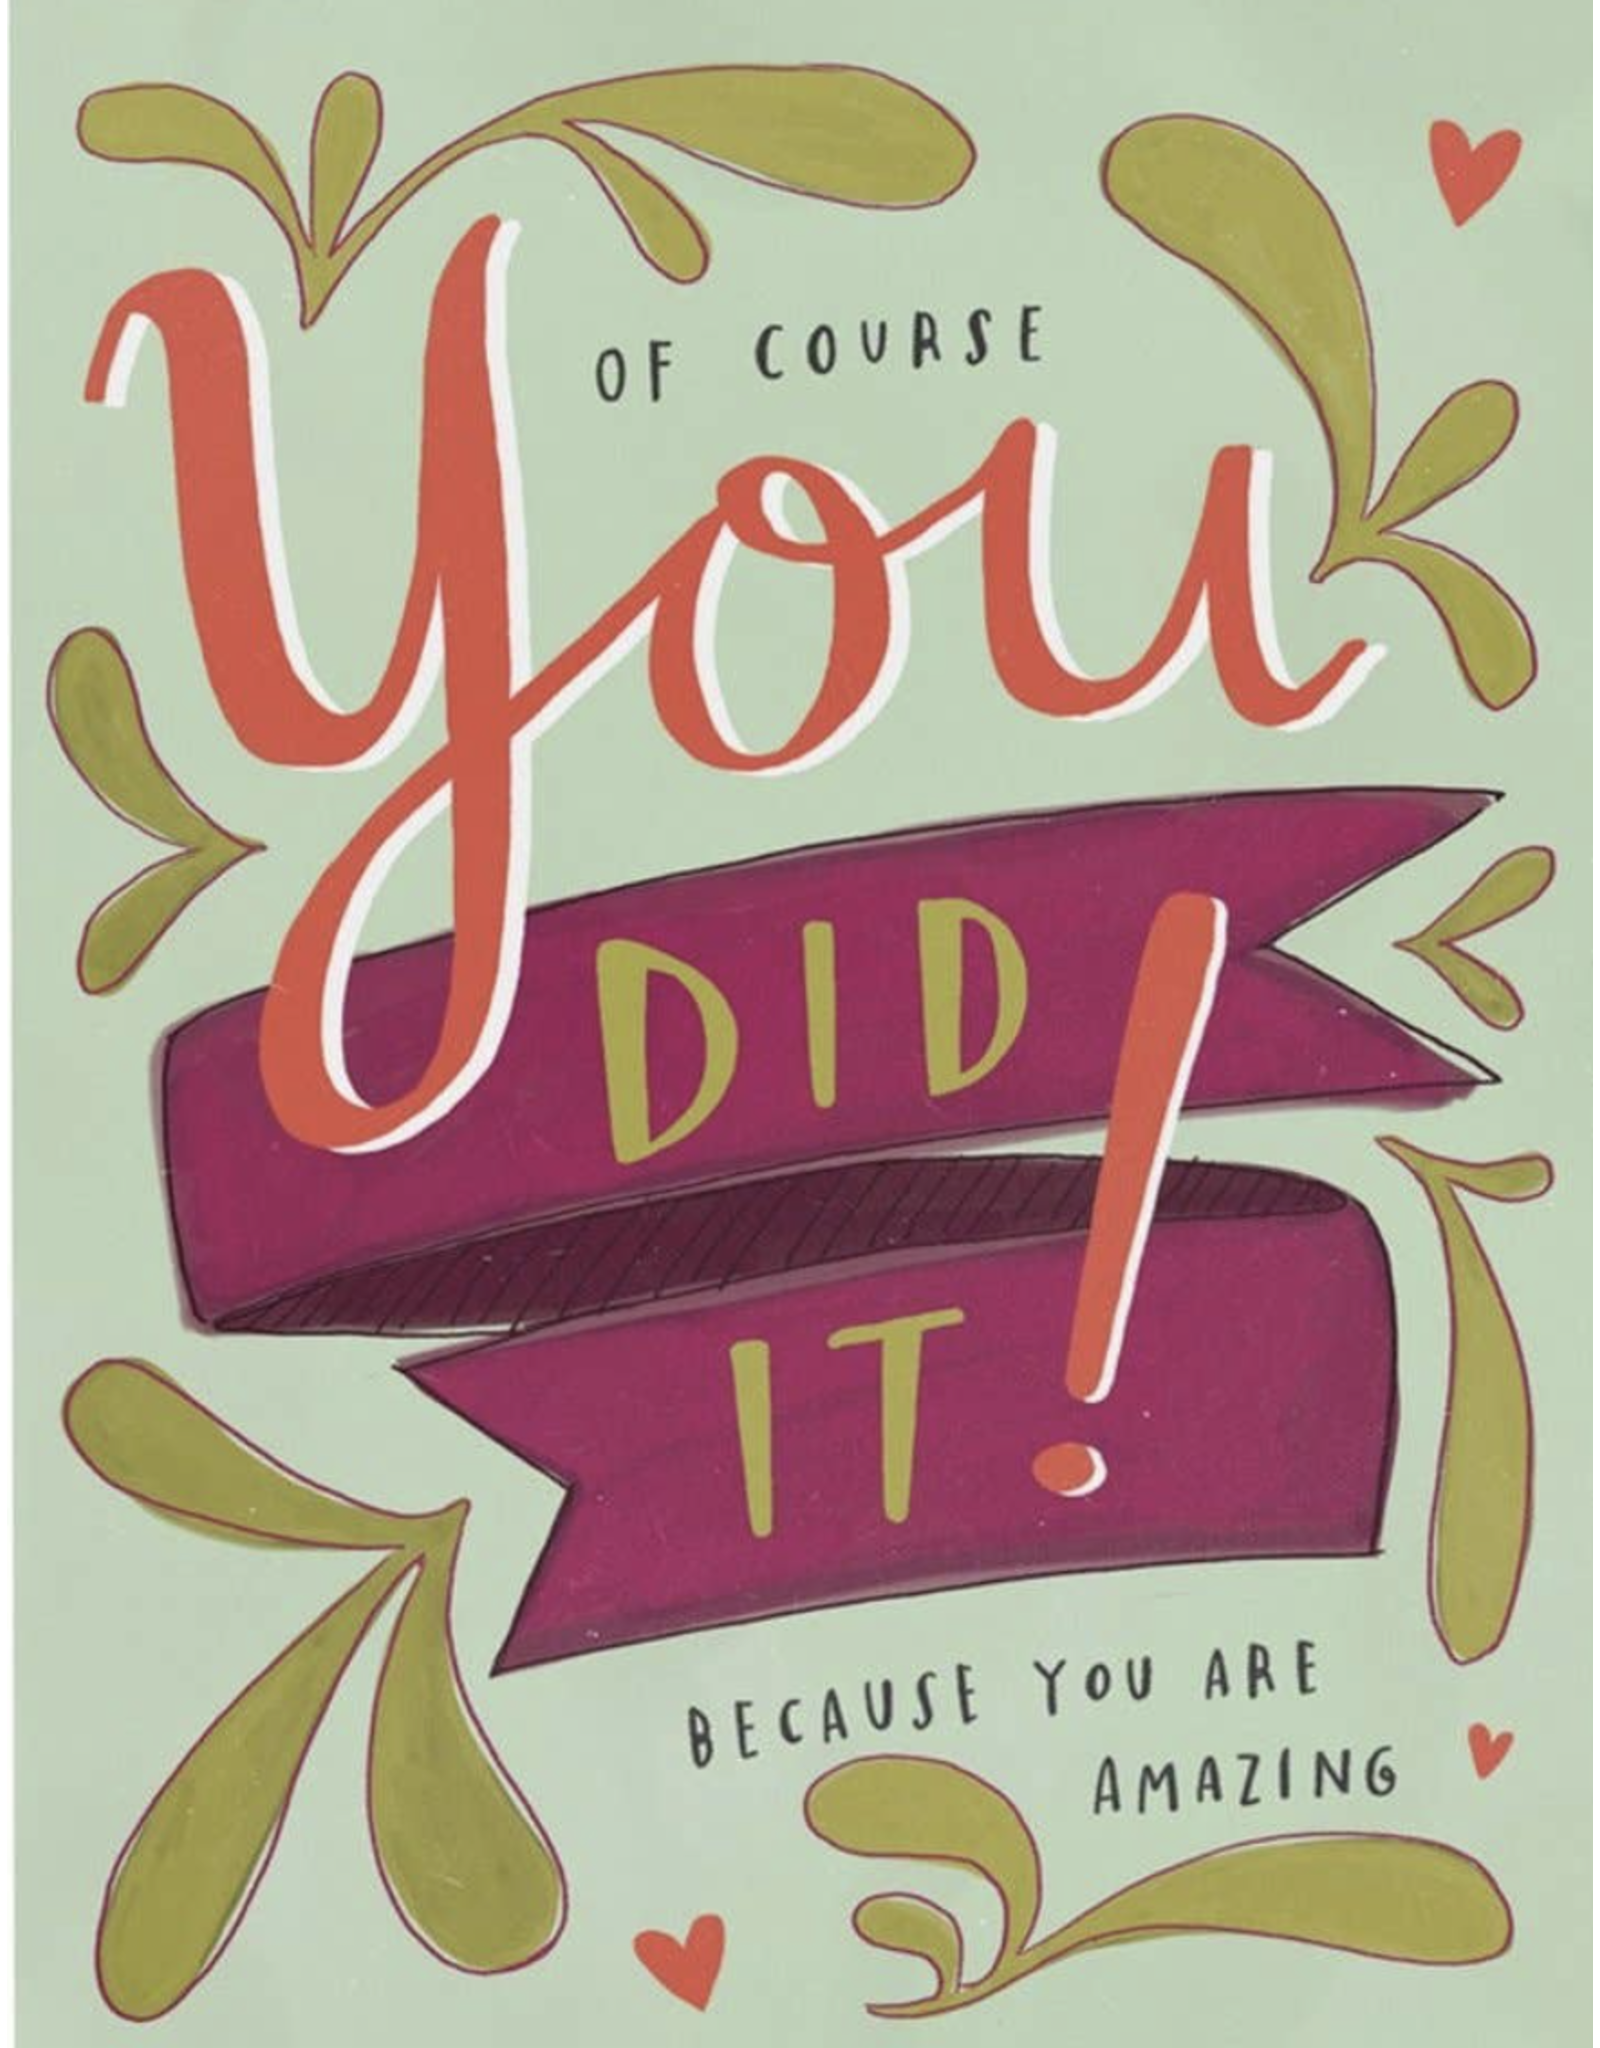 Graduation - You Did It